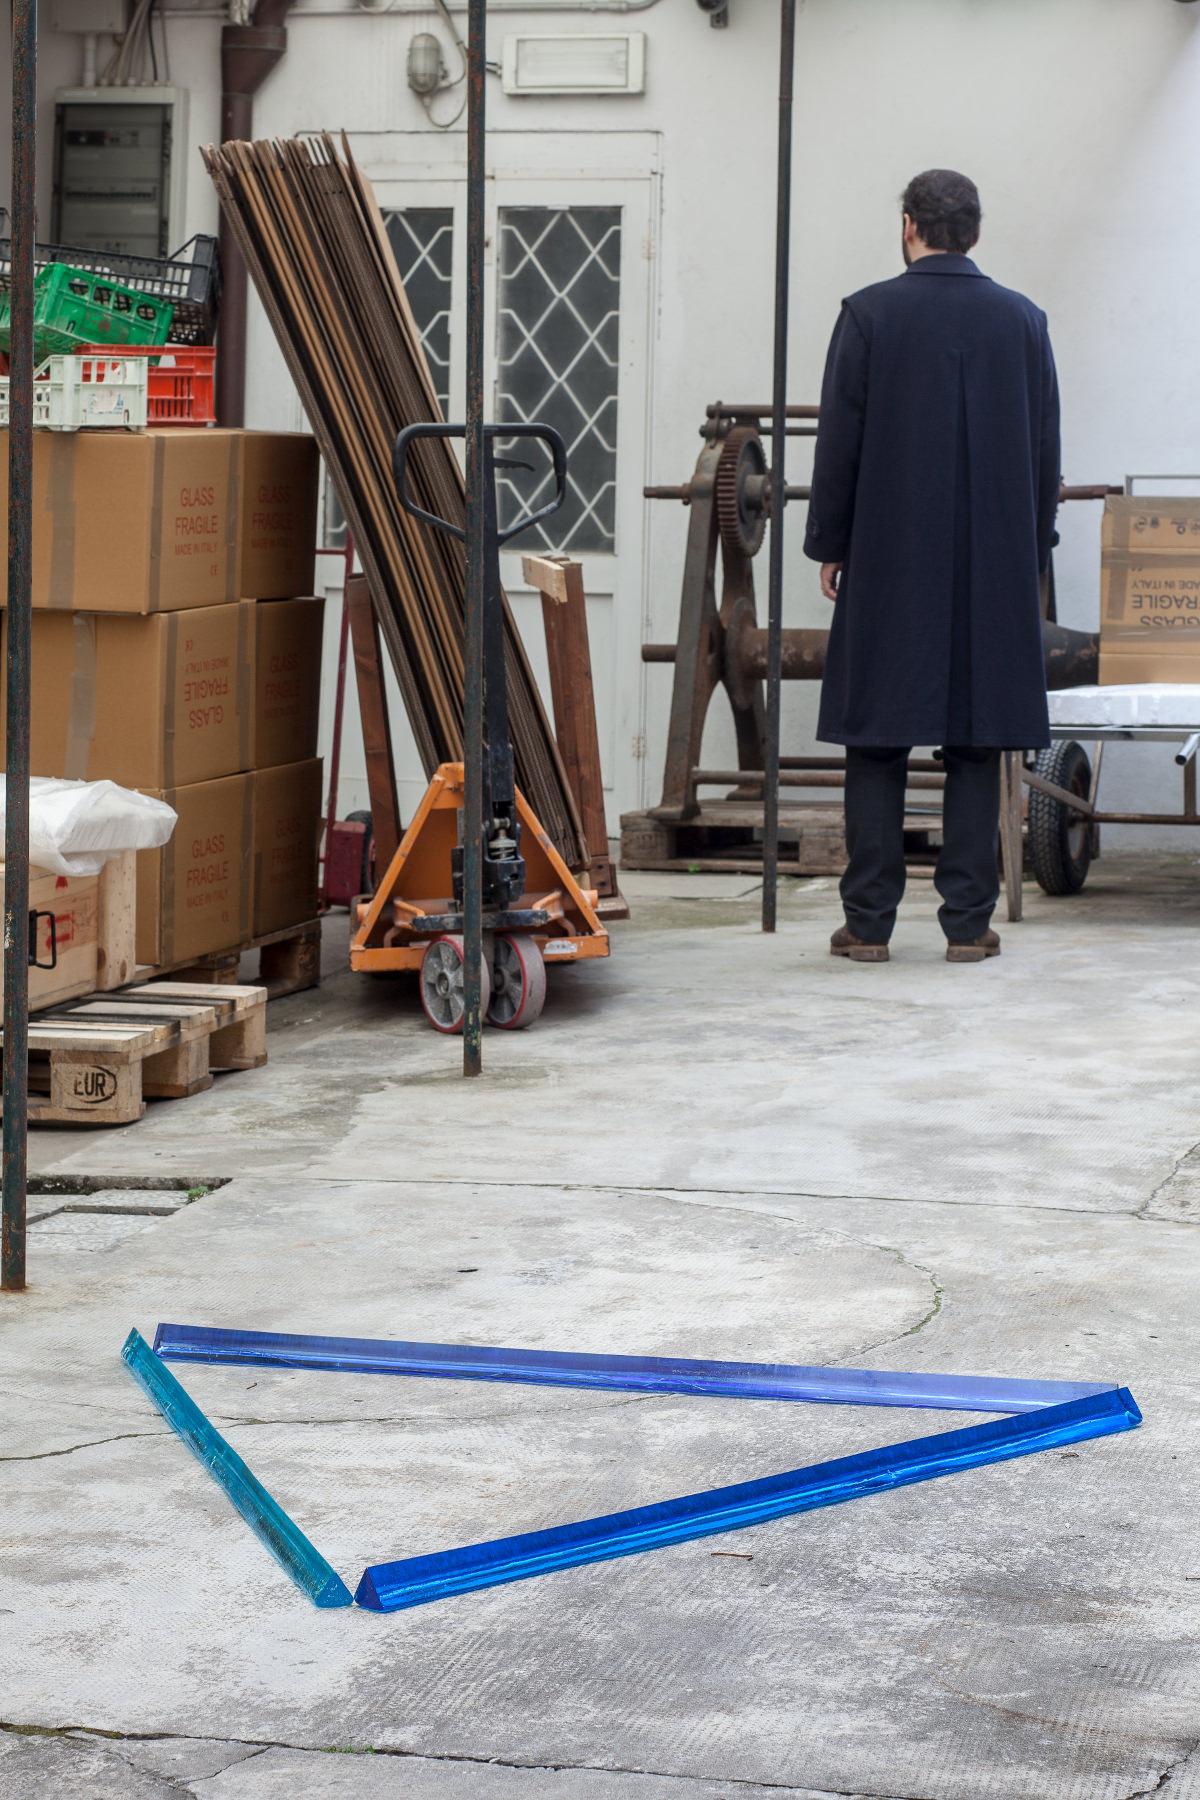 Francesco Gennari - Tre Colori per Presentarmi al Mondo, la Mattina